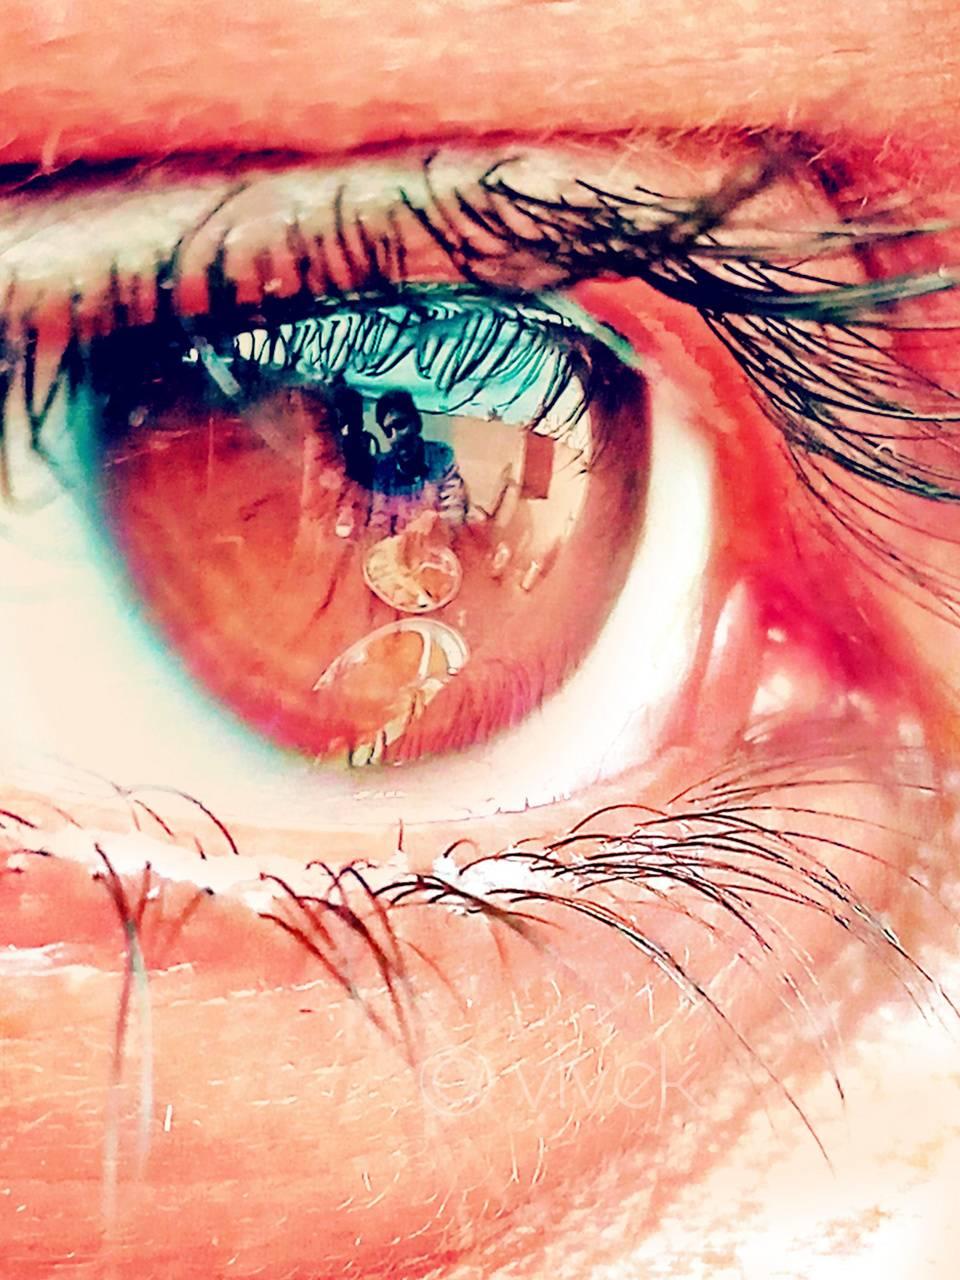 Eye tells everything